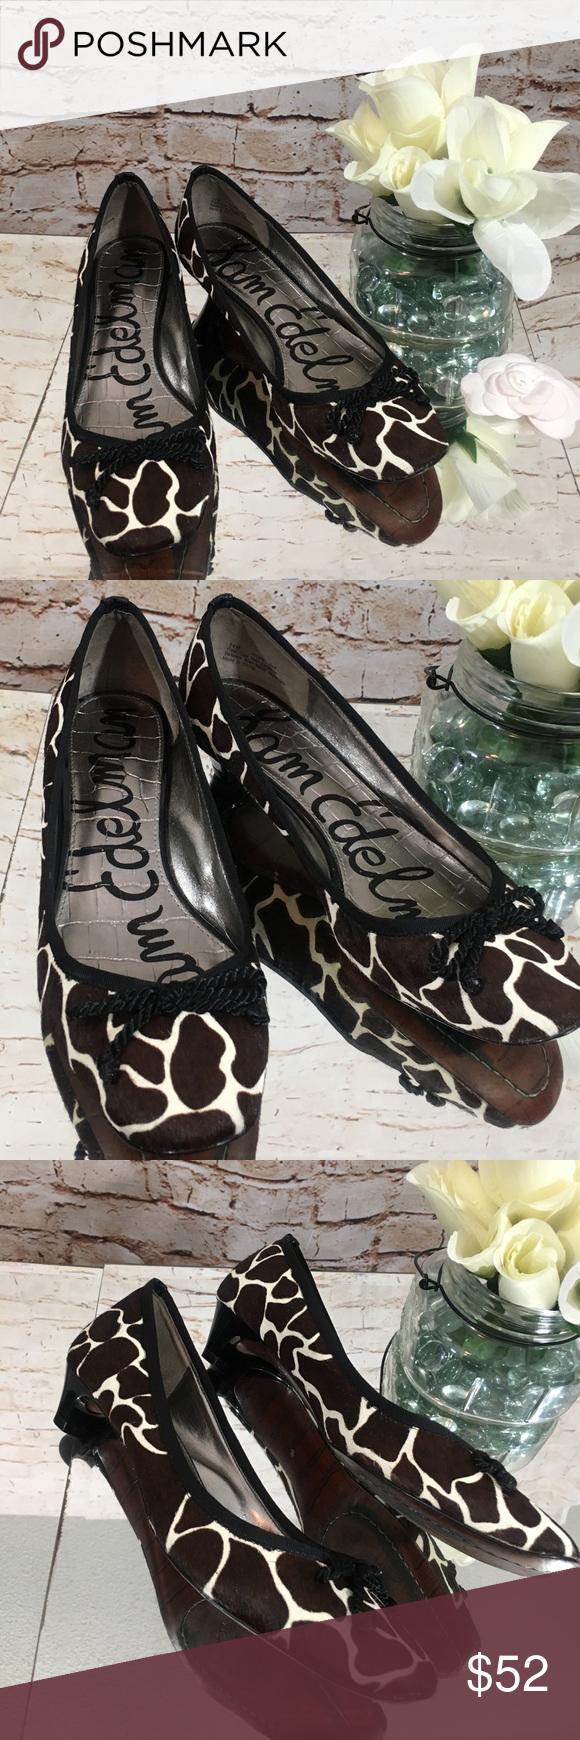 107c119d0a 🐾Sam Edelman Hope Animal Print Cowhide Heel Flats Low heel pumps made of cow  hair